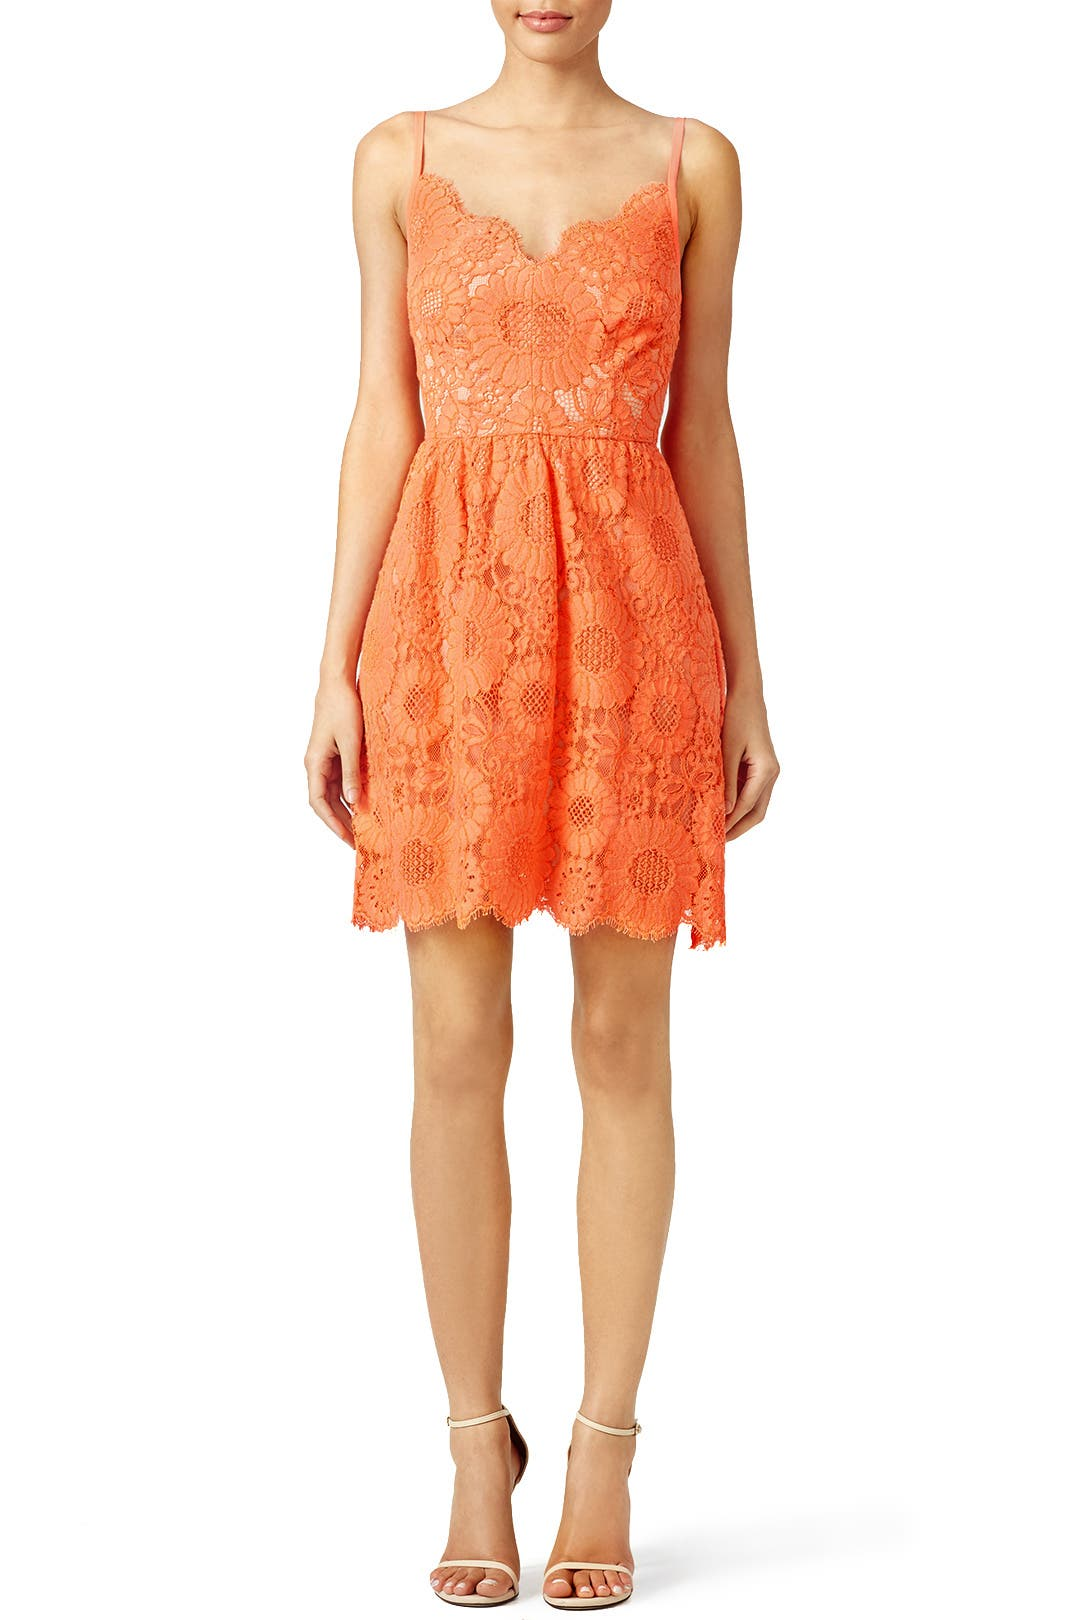 Trina Turk Orange Alcott Dress